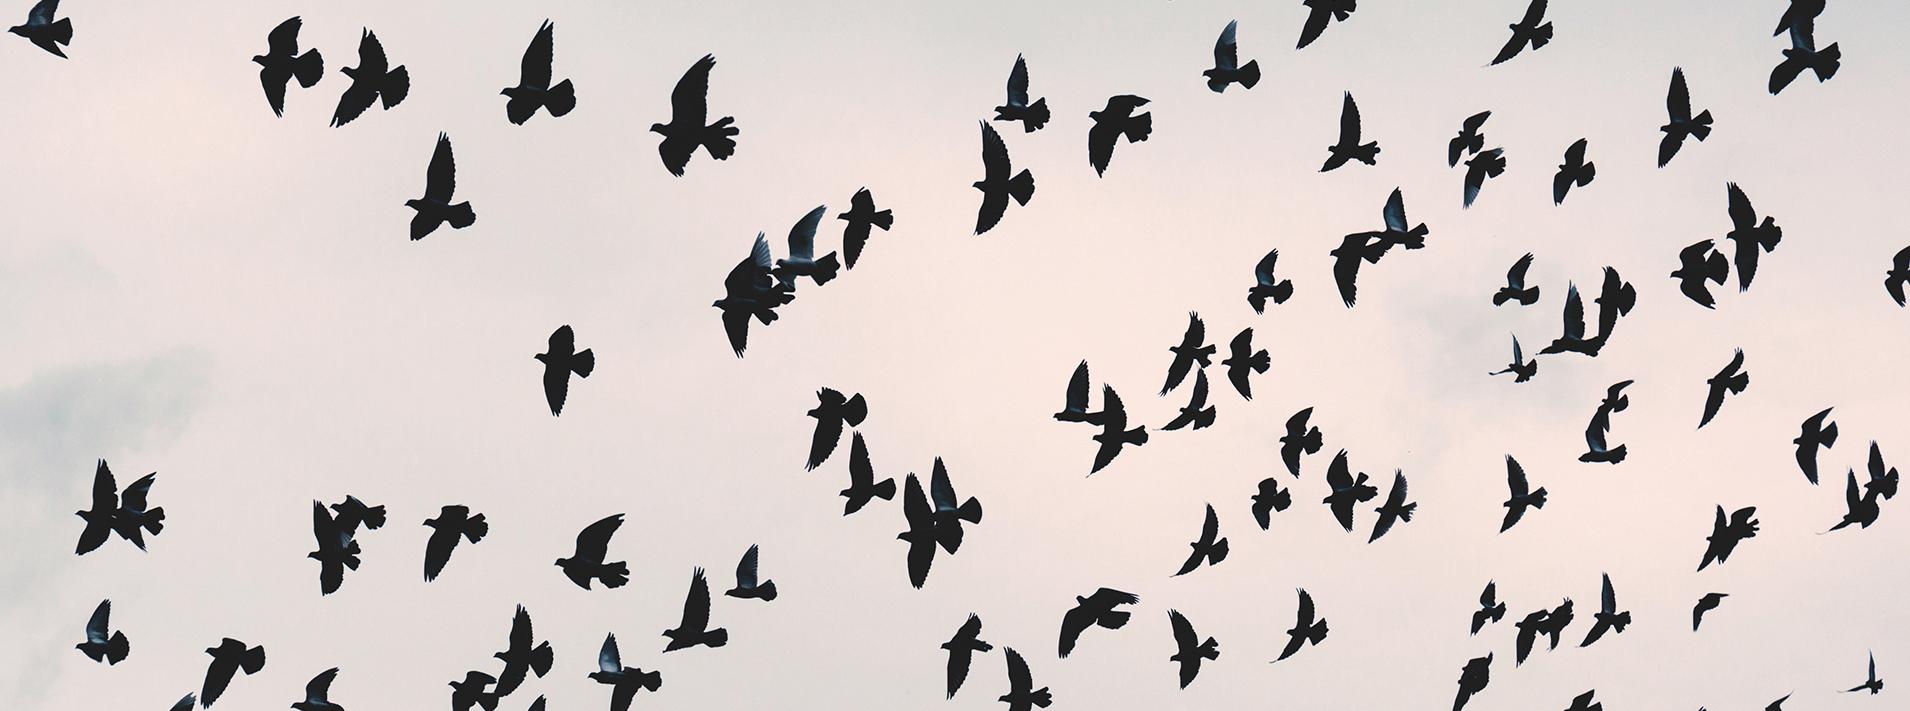 flying_pidgeons 2